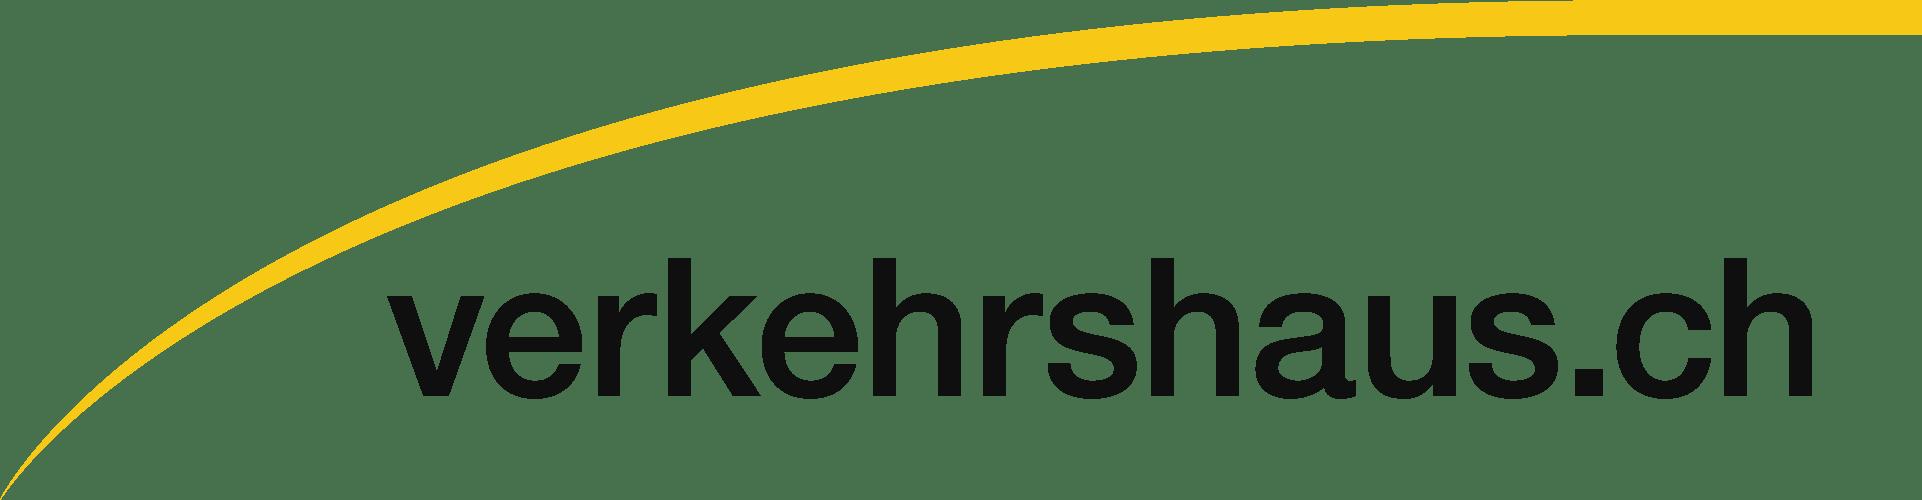 partner_verkehrshaus-ch